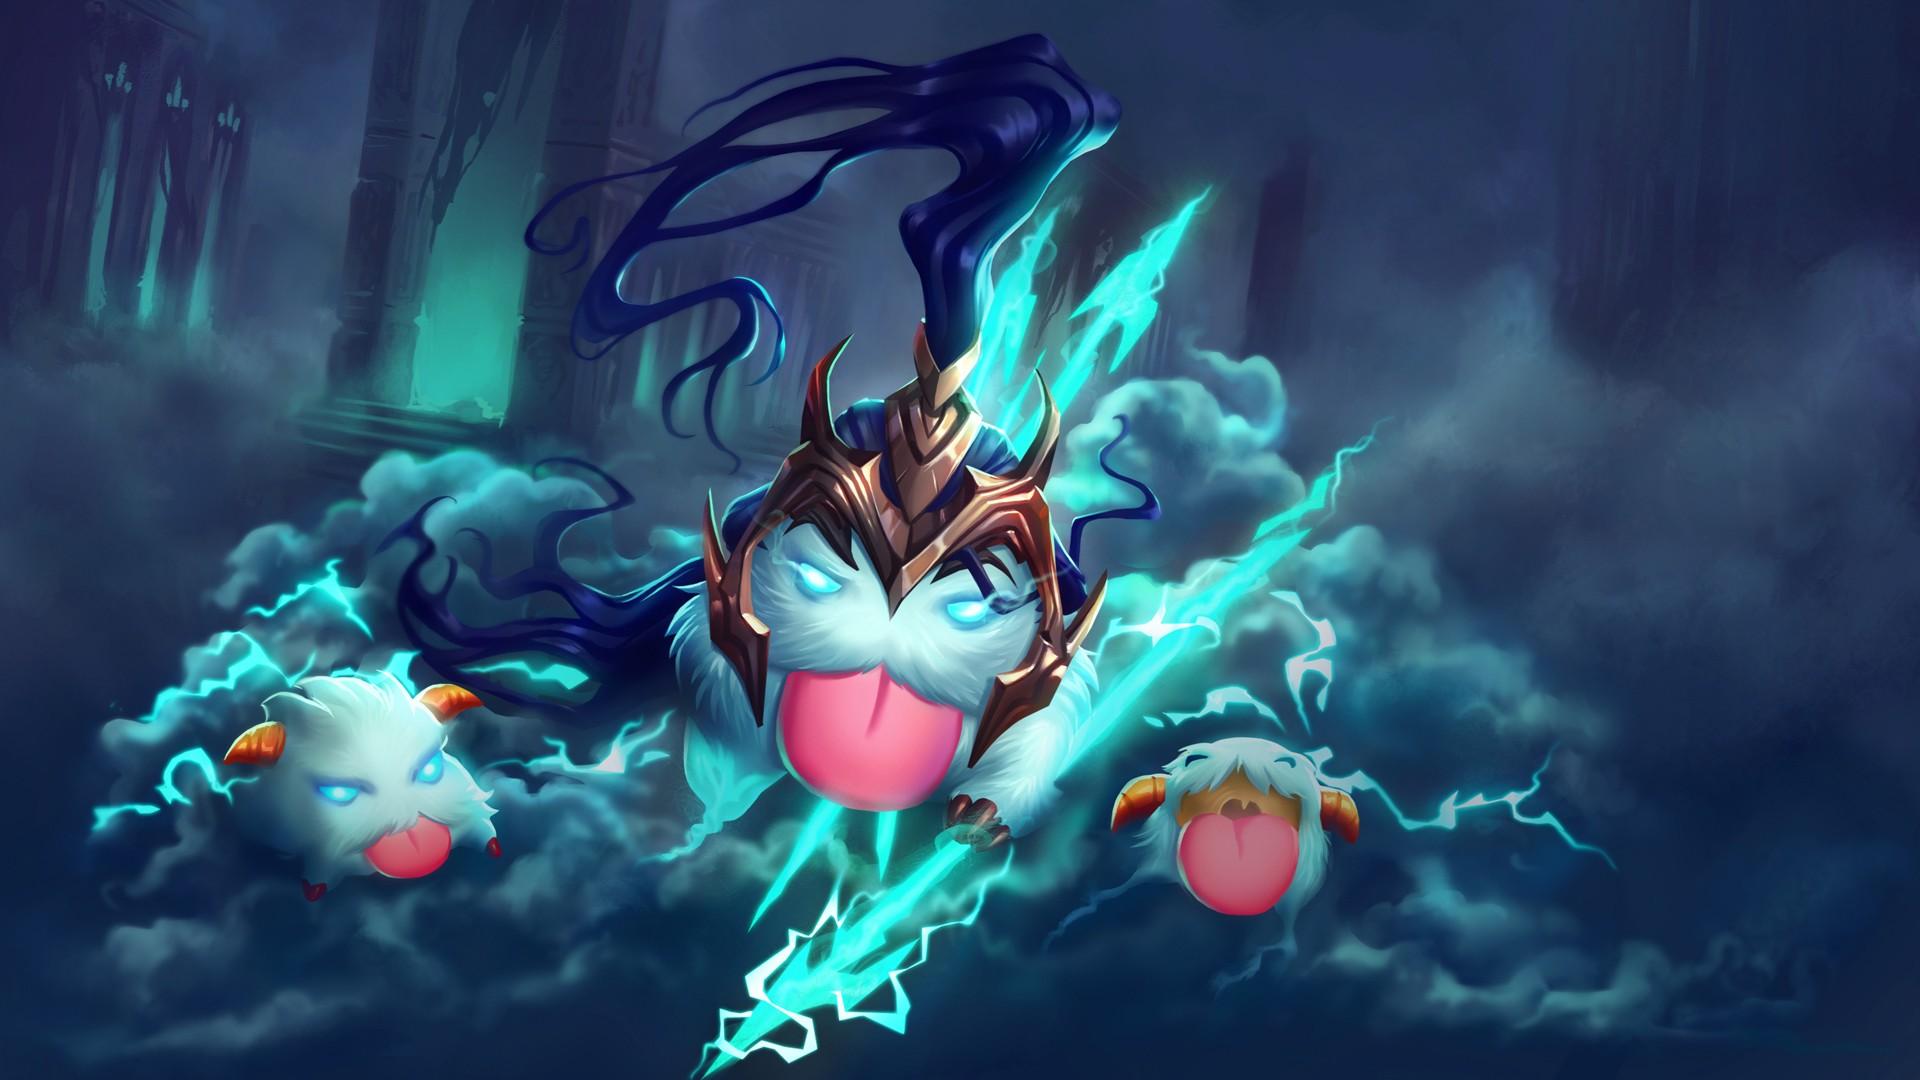 Illustration Video Games Fantasy Art Anime League Of Legends Poro Kalista Screenshot Mecha Computer Wallpaper